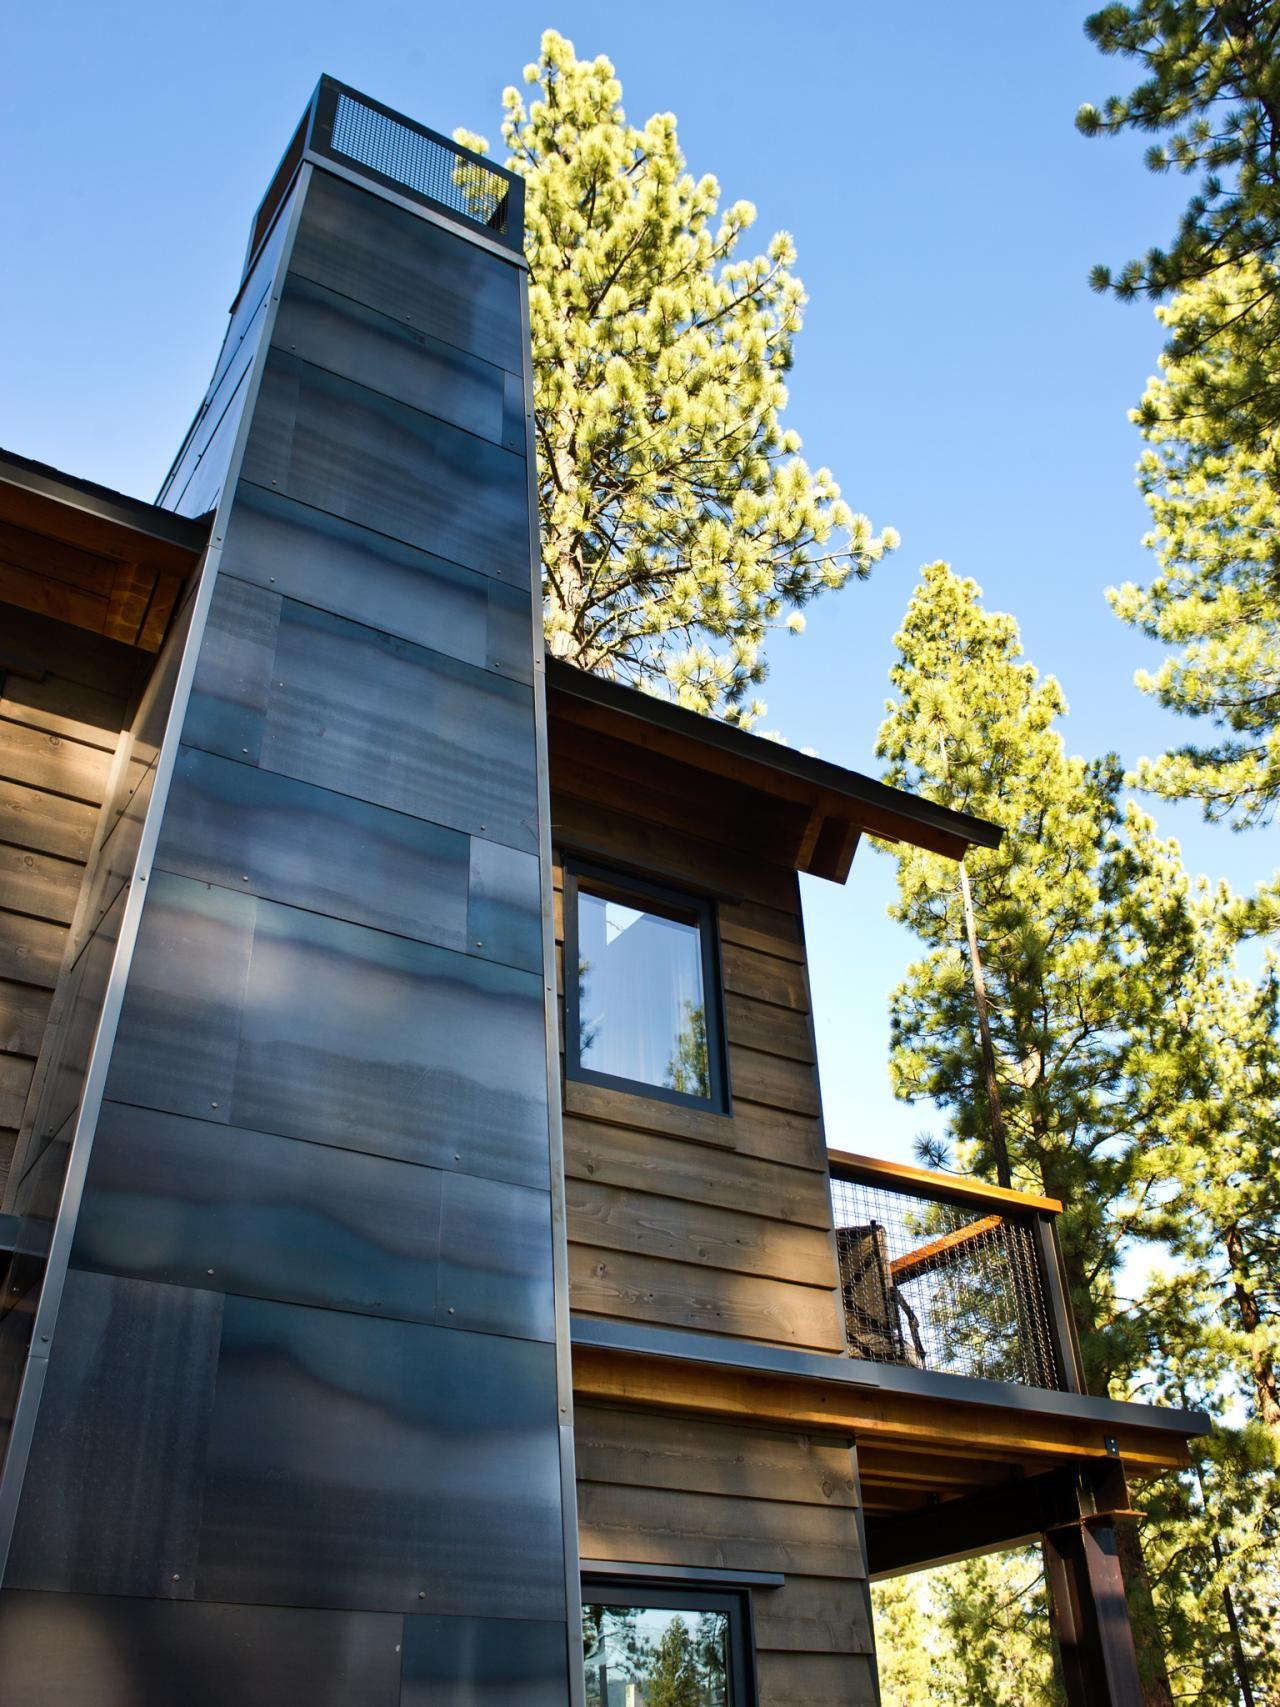 Dream Home 2014 Outdoor Kitchen Pictures | Rust, Steel and Metals